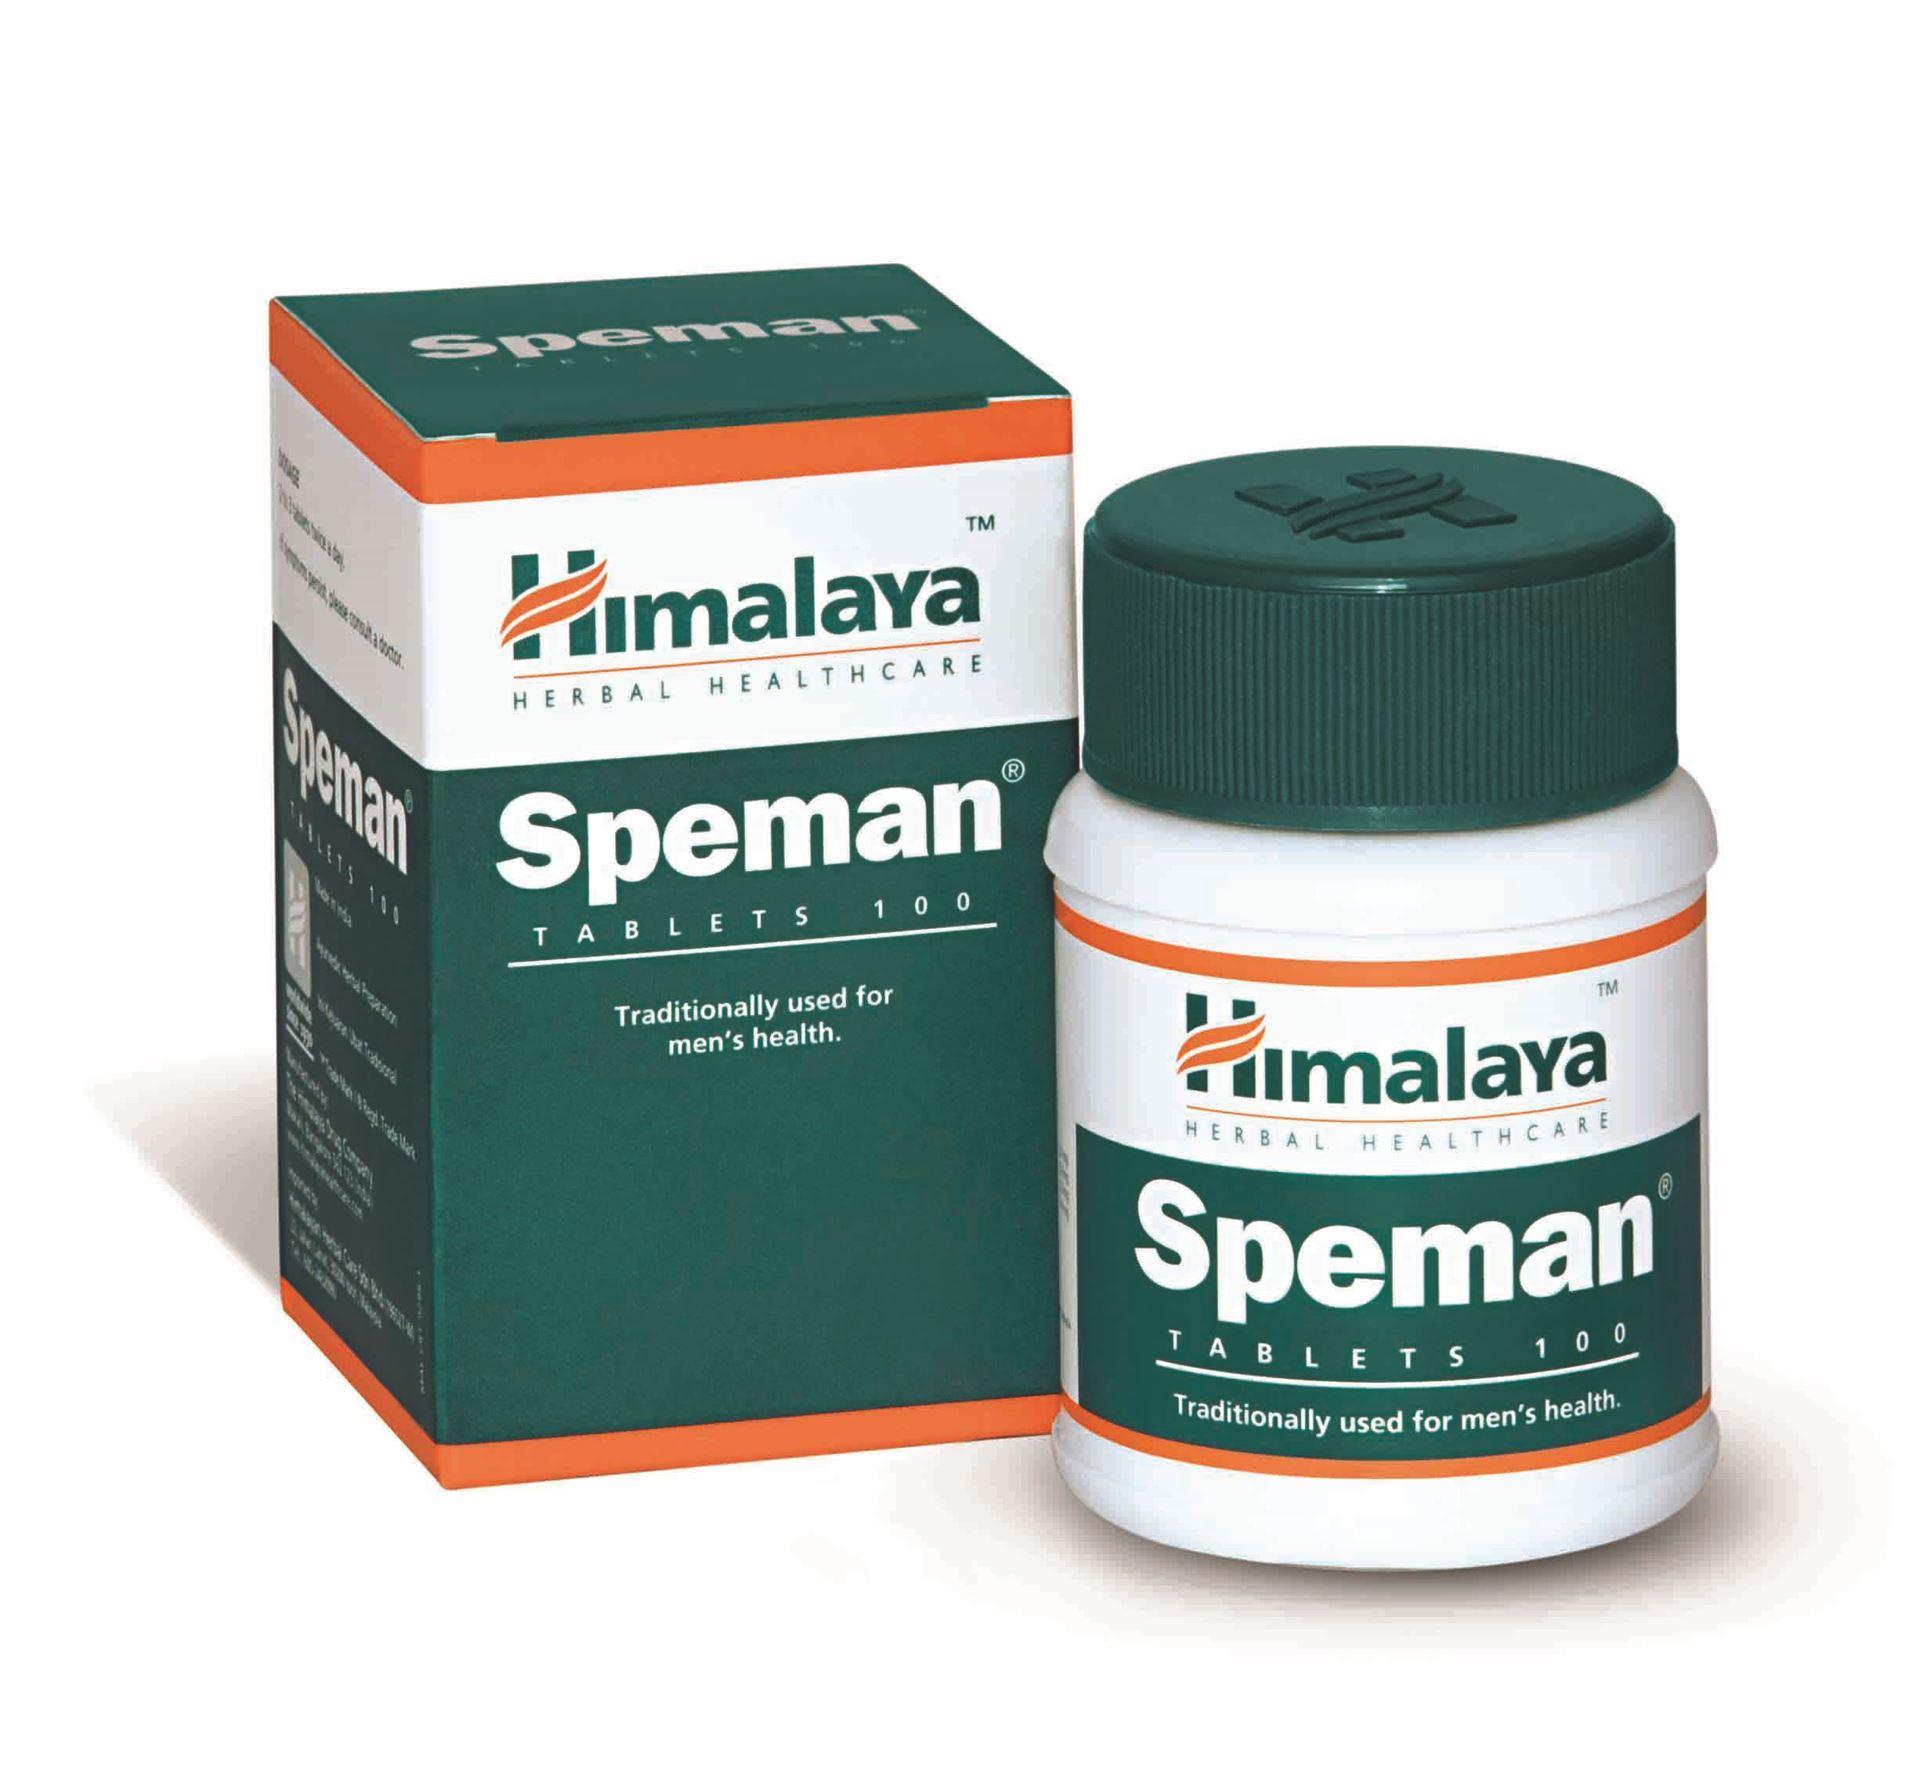 Local Mobile Fmcg Blackmores Natural E 250iu 50 Capsules Himalaya Sperman 100 Tablets Increase Sperm